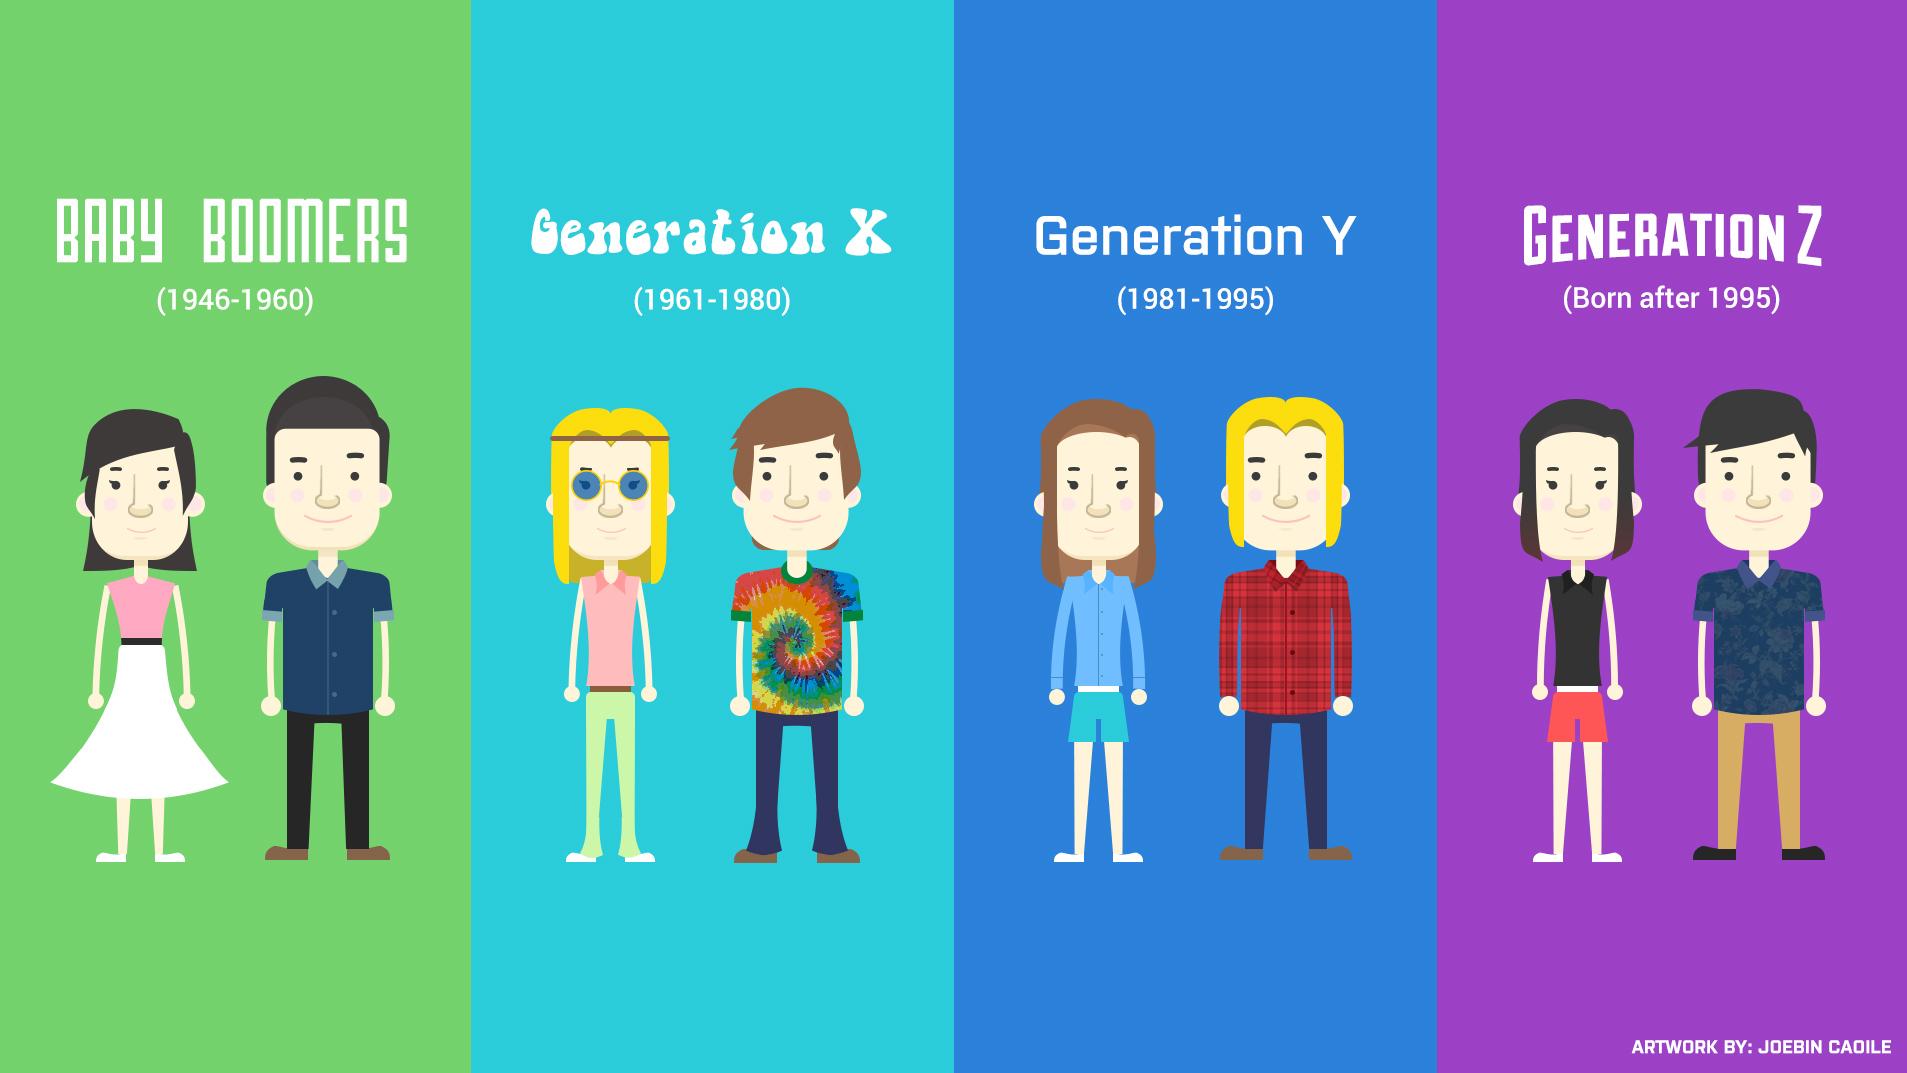 Generations X Y Z et Travail.jpg